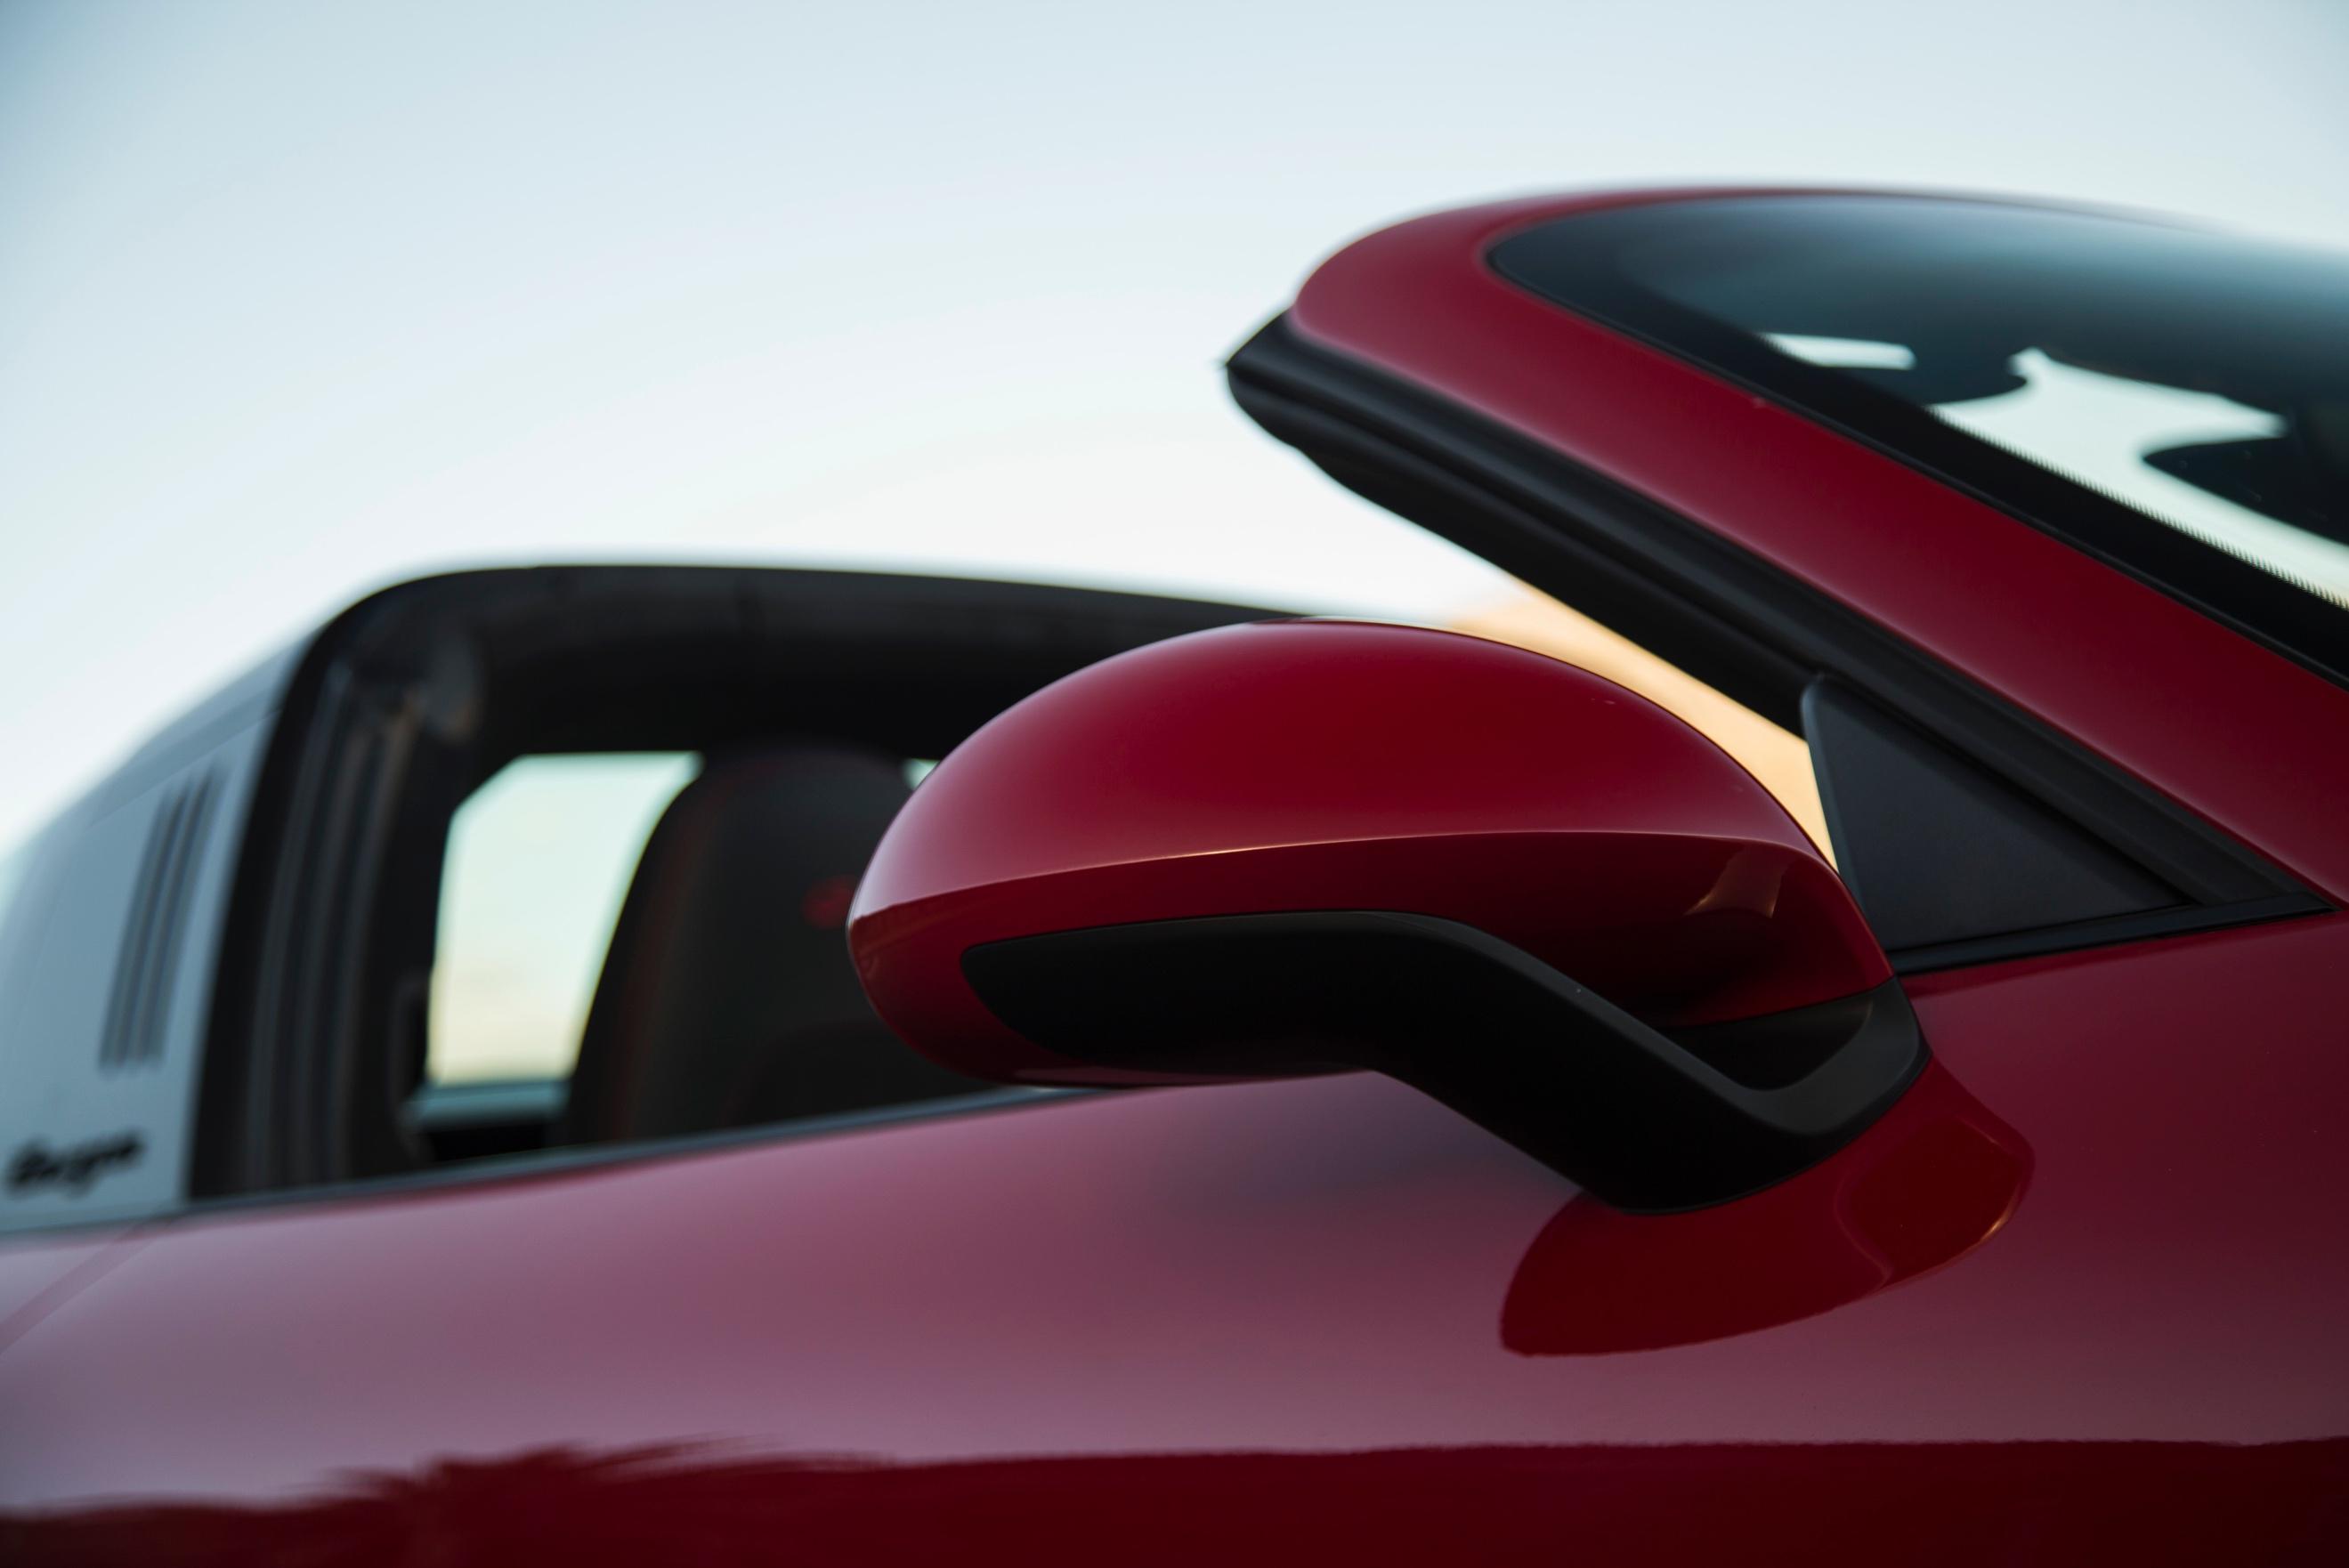 ../Porsche%20Press%20Kits/done/00003_911GTSLaunch/29r8904_high.jpg